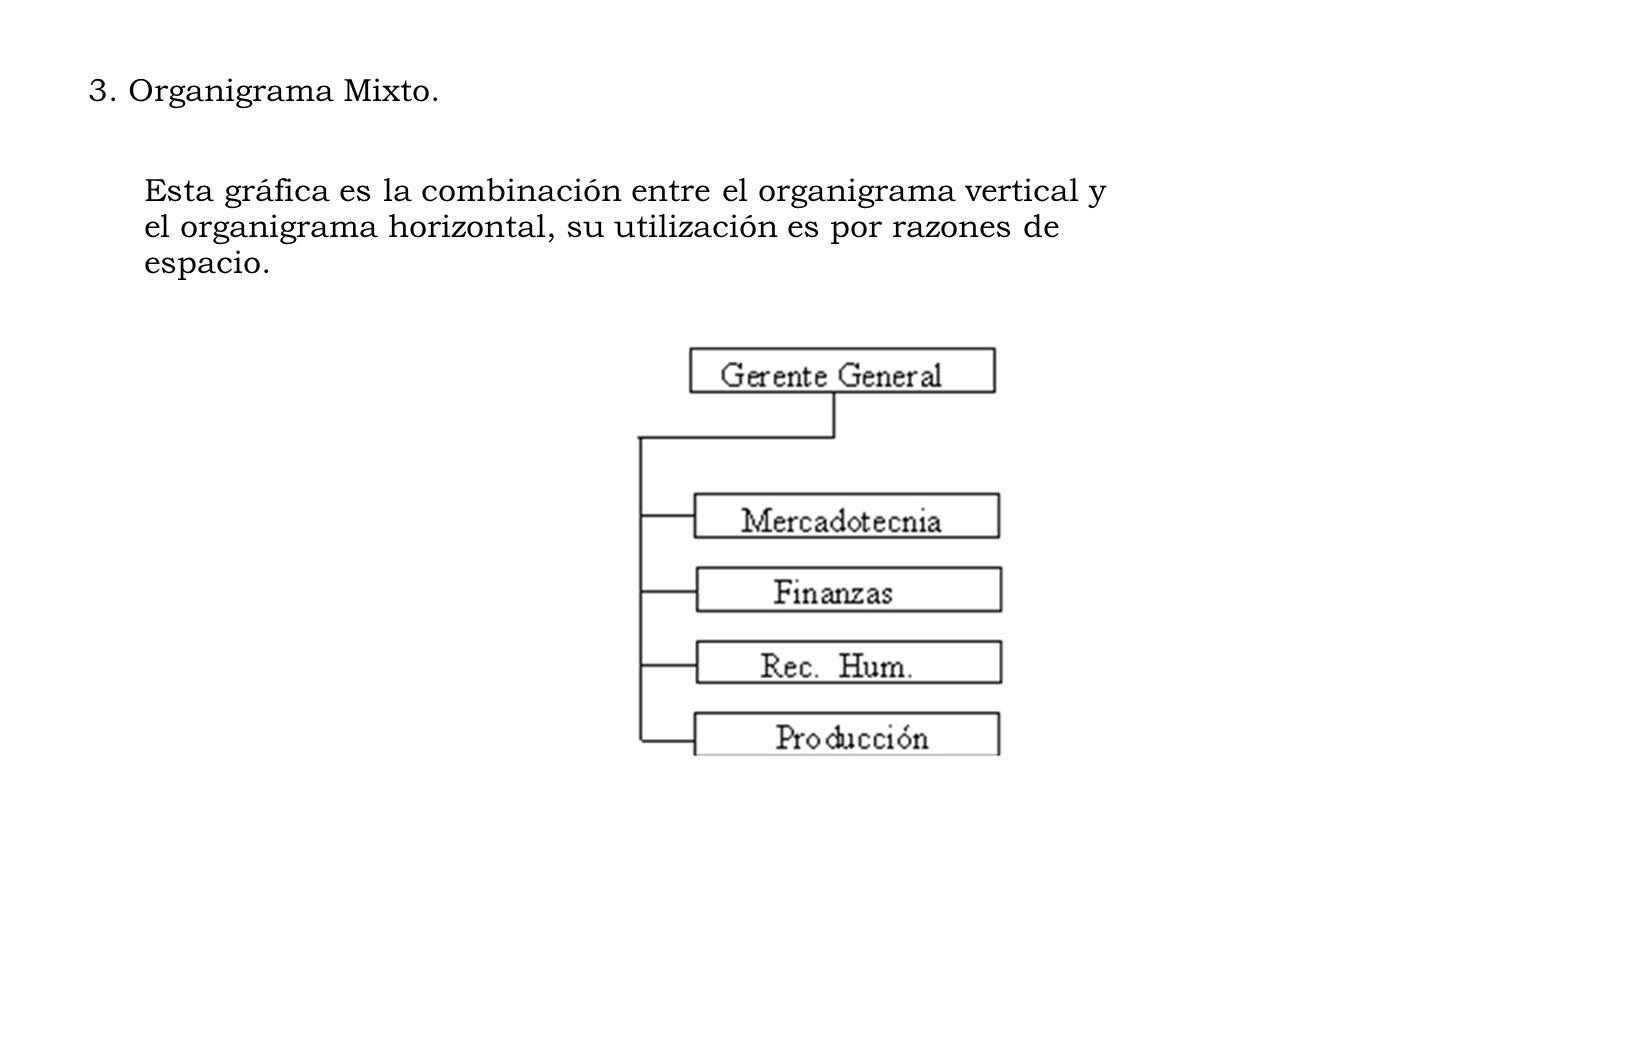 3.Organigrama Mixto.